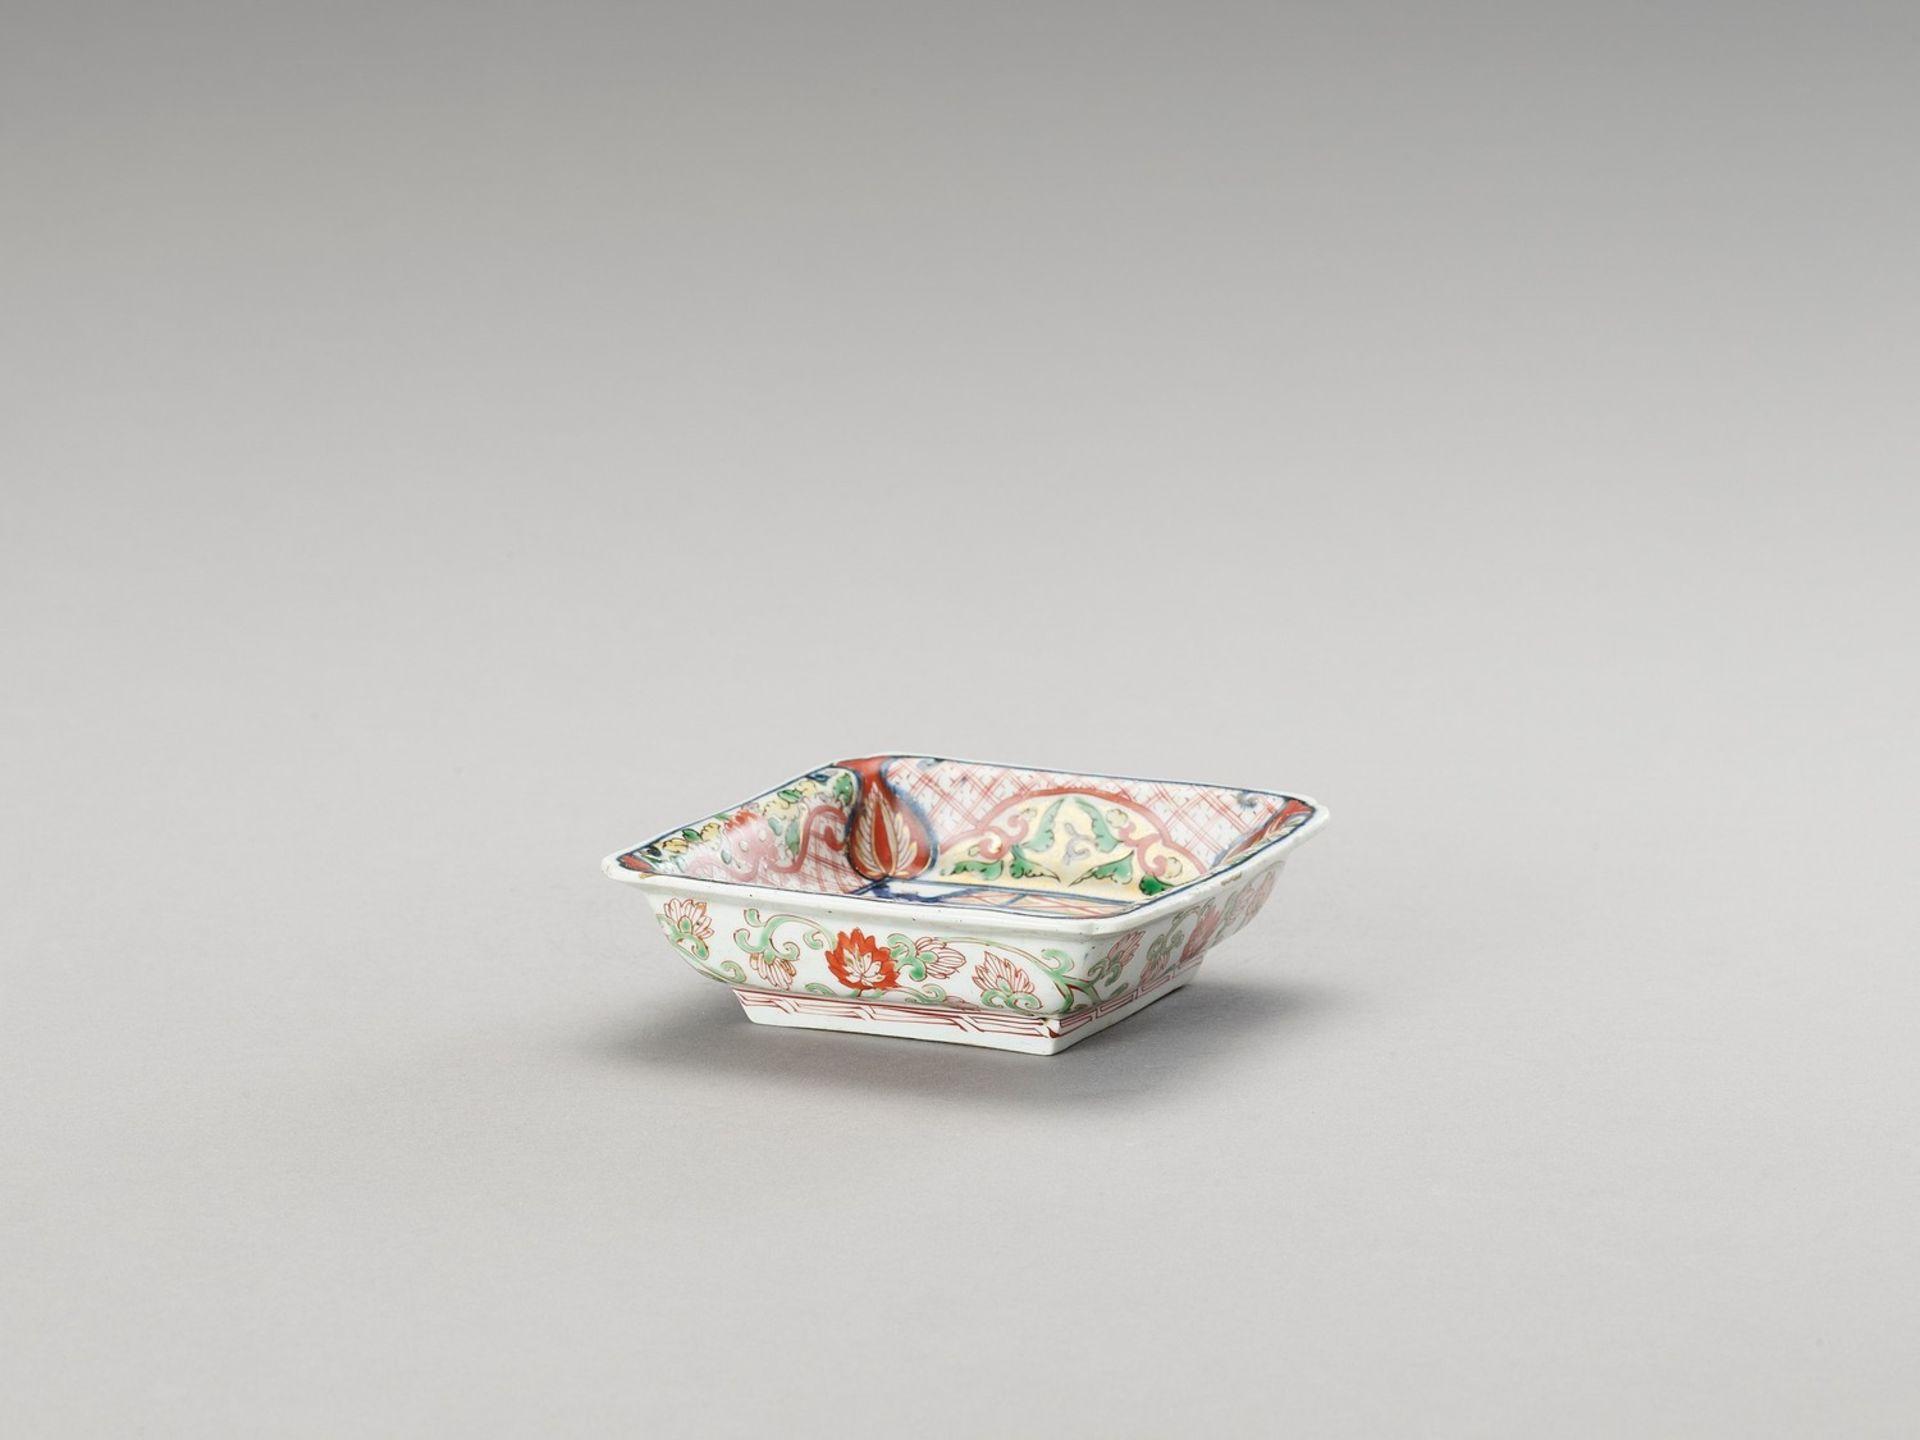 A SMALL SQUARE IMARI PORCELAIN DISH - Image 3 of 4